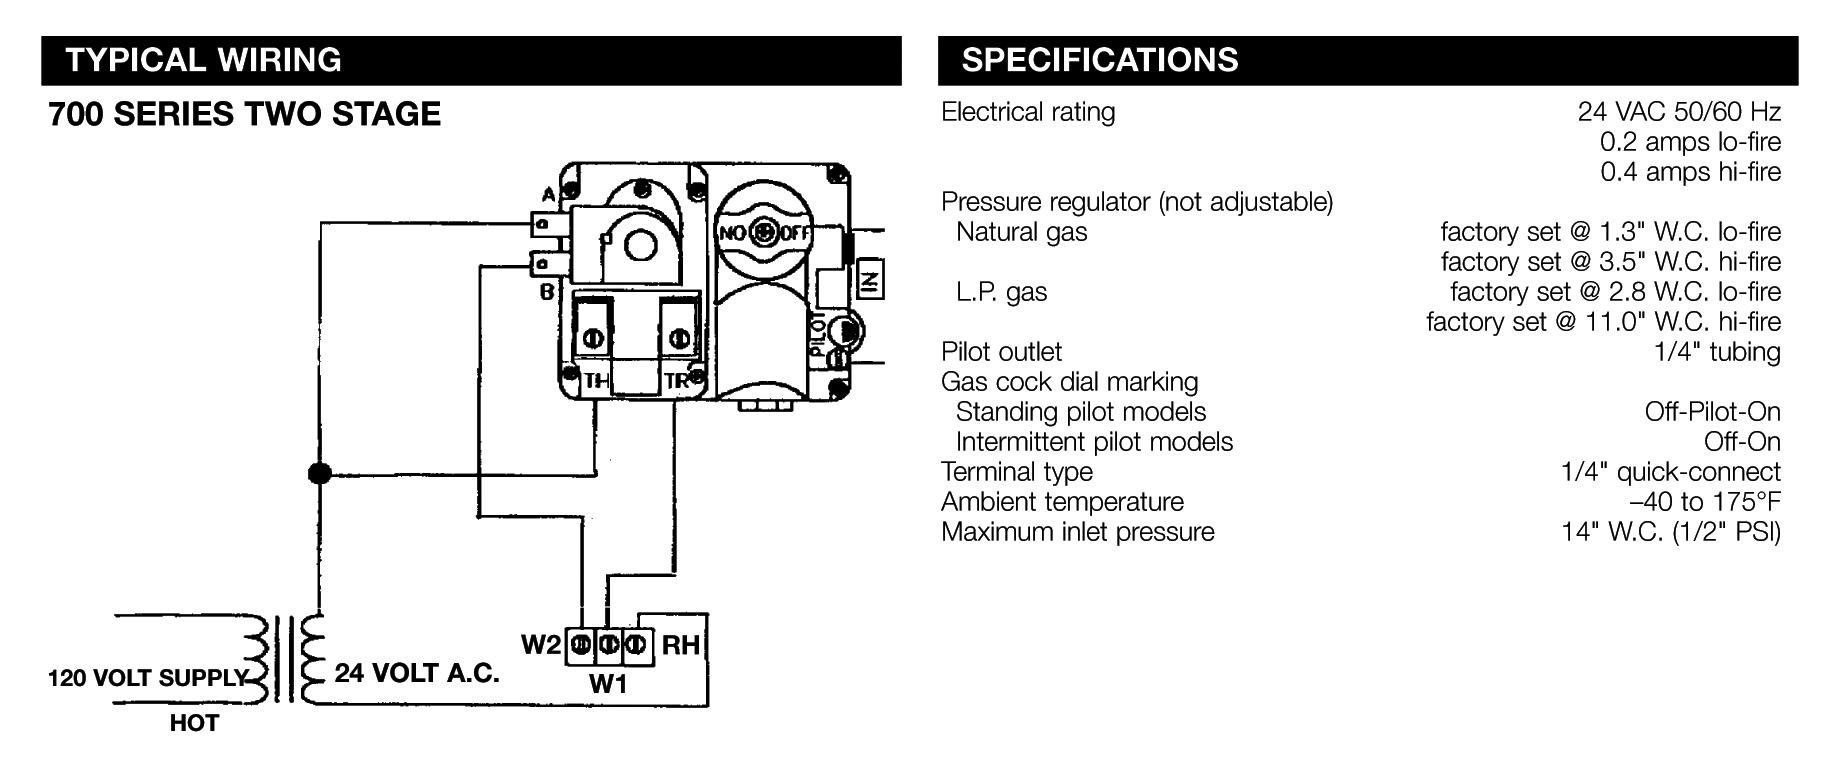 787cc71d fa10 4f03 824b c5b9bcc9b3d8?resize=665%2C281&ssl=1 gas valve wiring diagram robertshaw wiring diagram Robertshaw Gas Valve 710 502 at soozxer.org